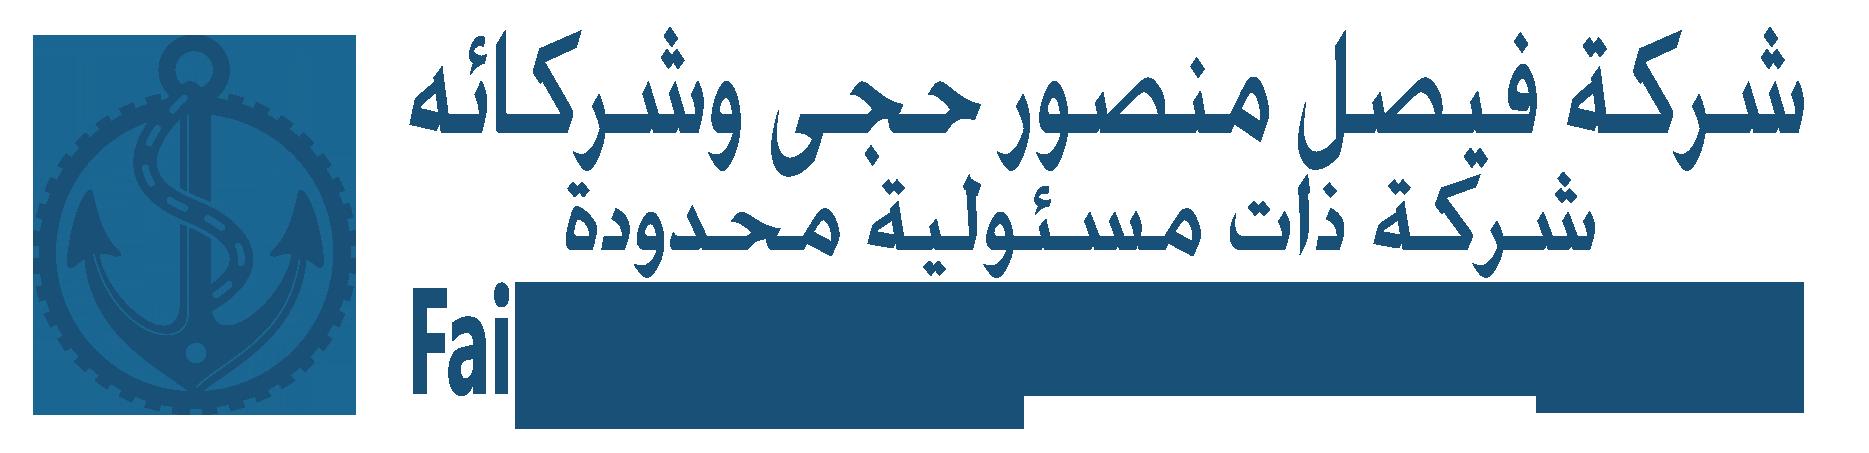 Faisal M. Higgi & Associates Co., Ltd.